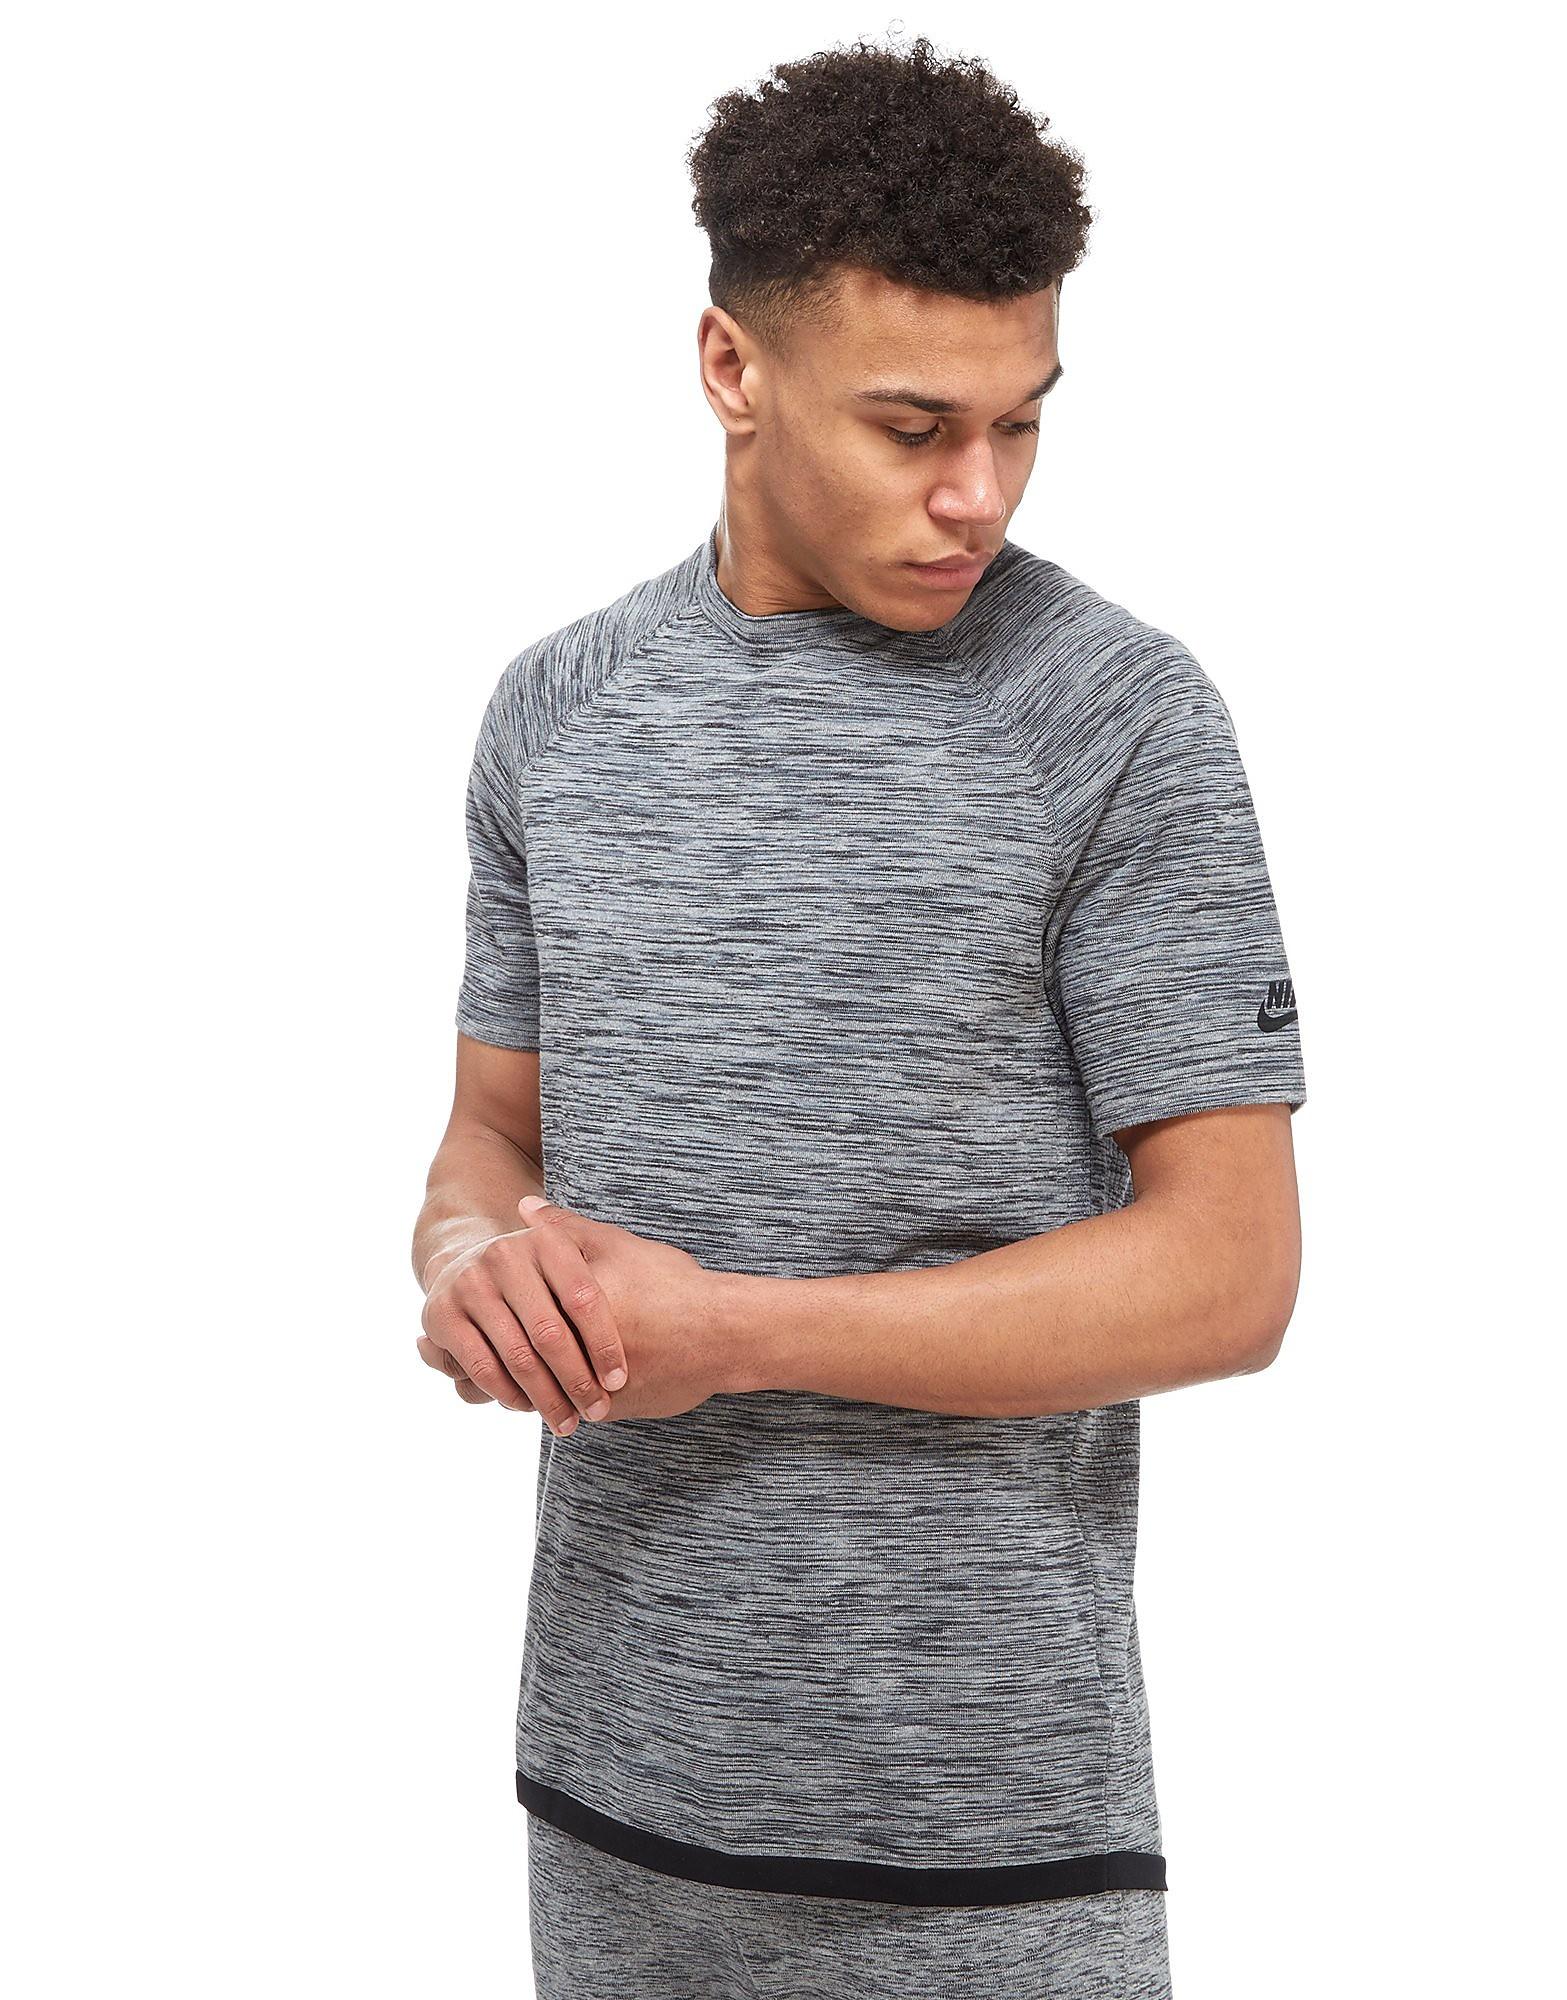 Nike Sportswear Tech Knit T-Shirt